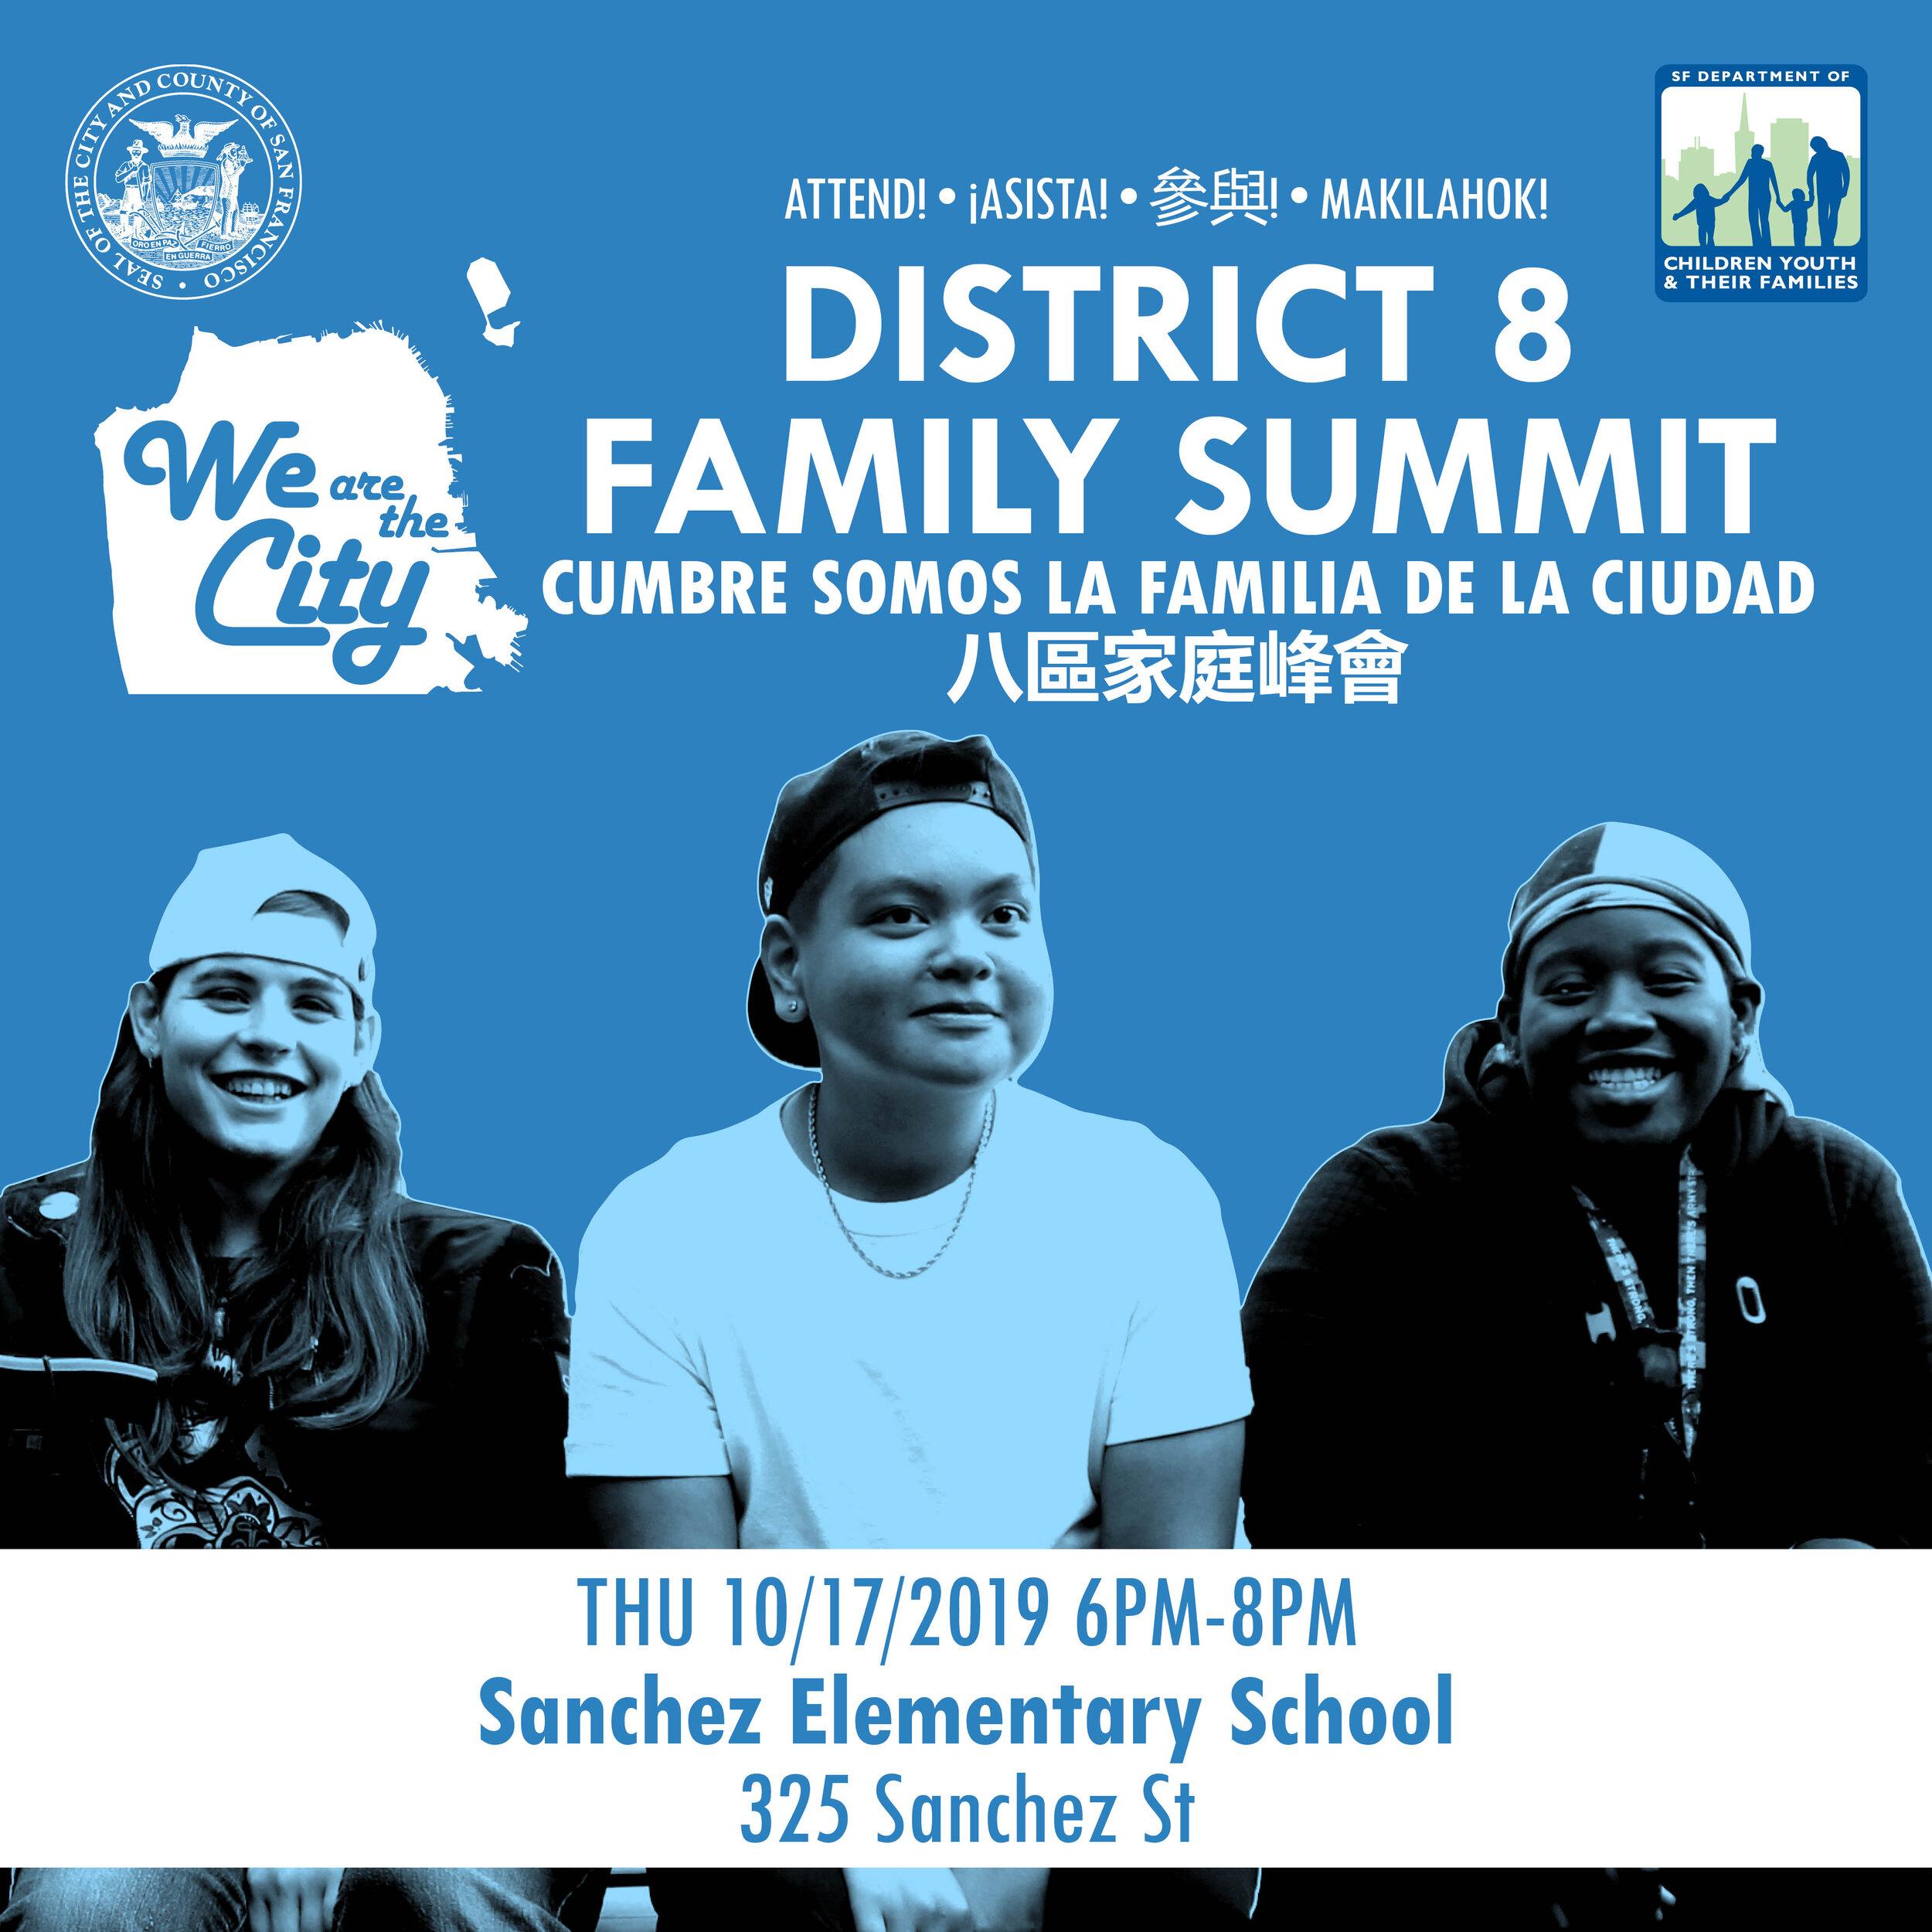 FamilySummits_social_district8.jpg